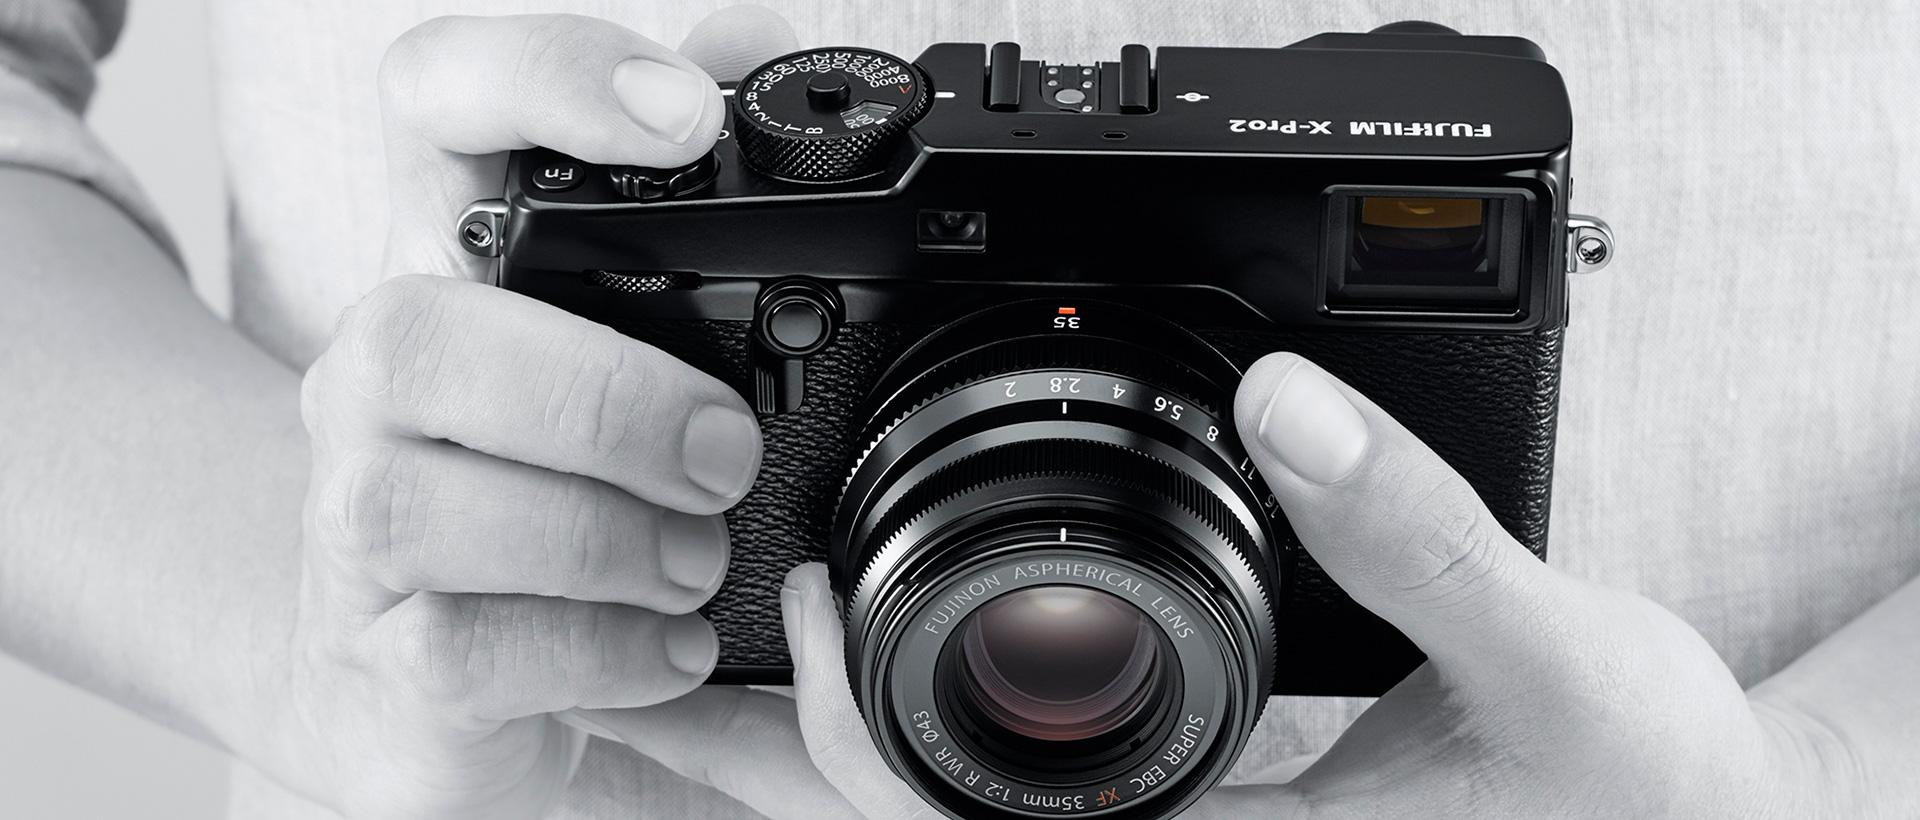 Fujifilm X Systemkameras @ Photohaus.de